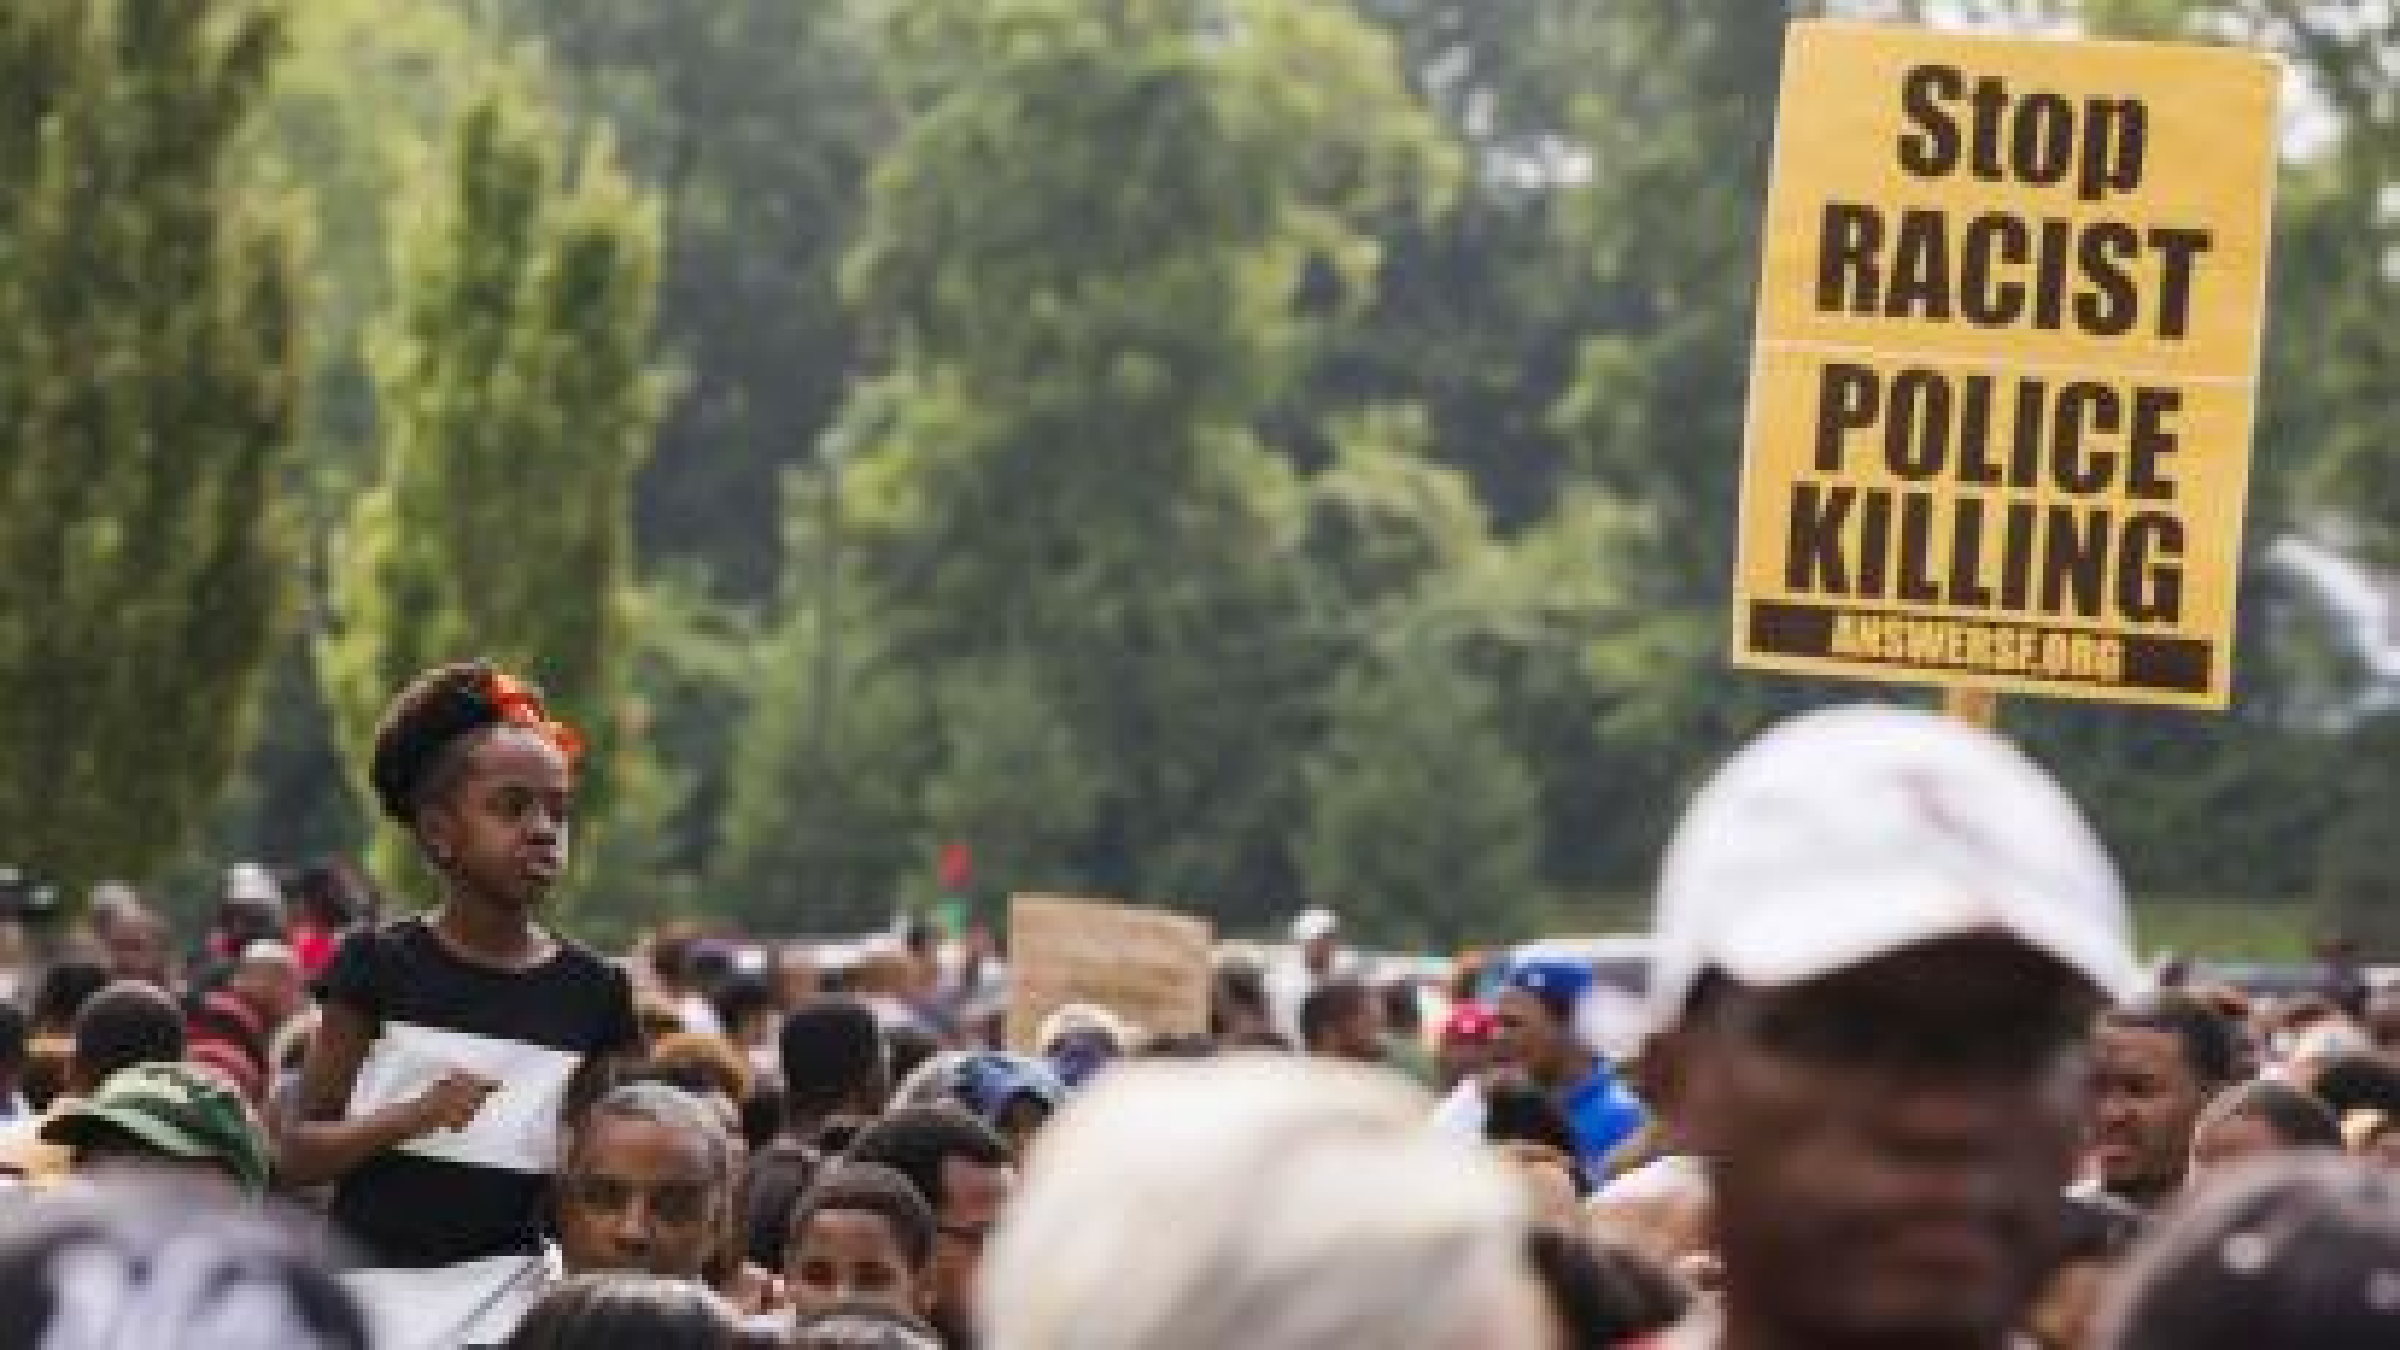 Stop racism sign